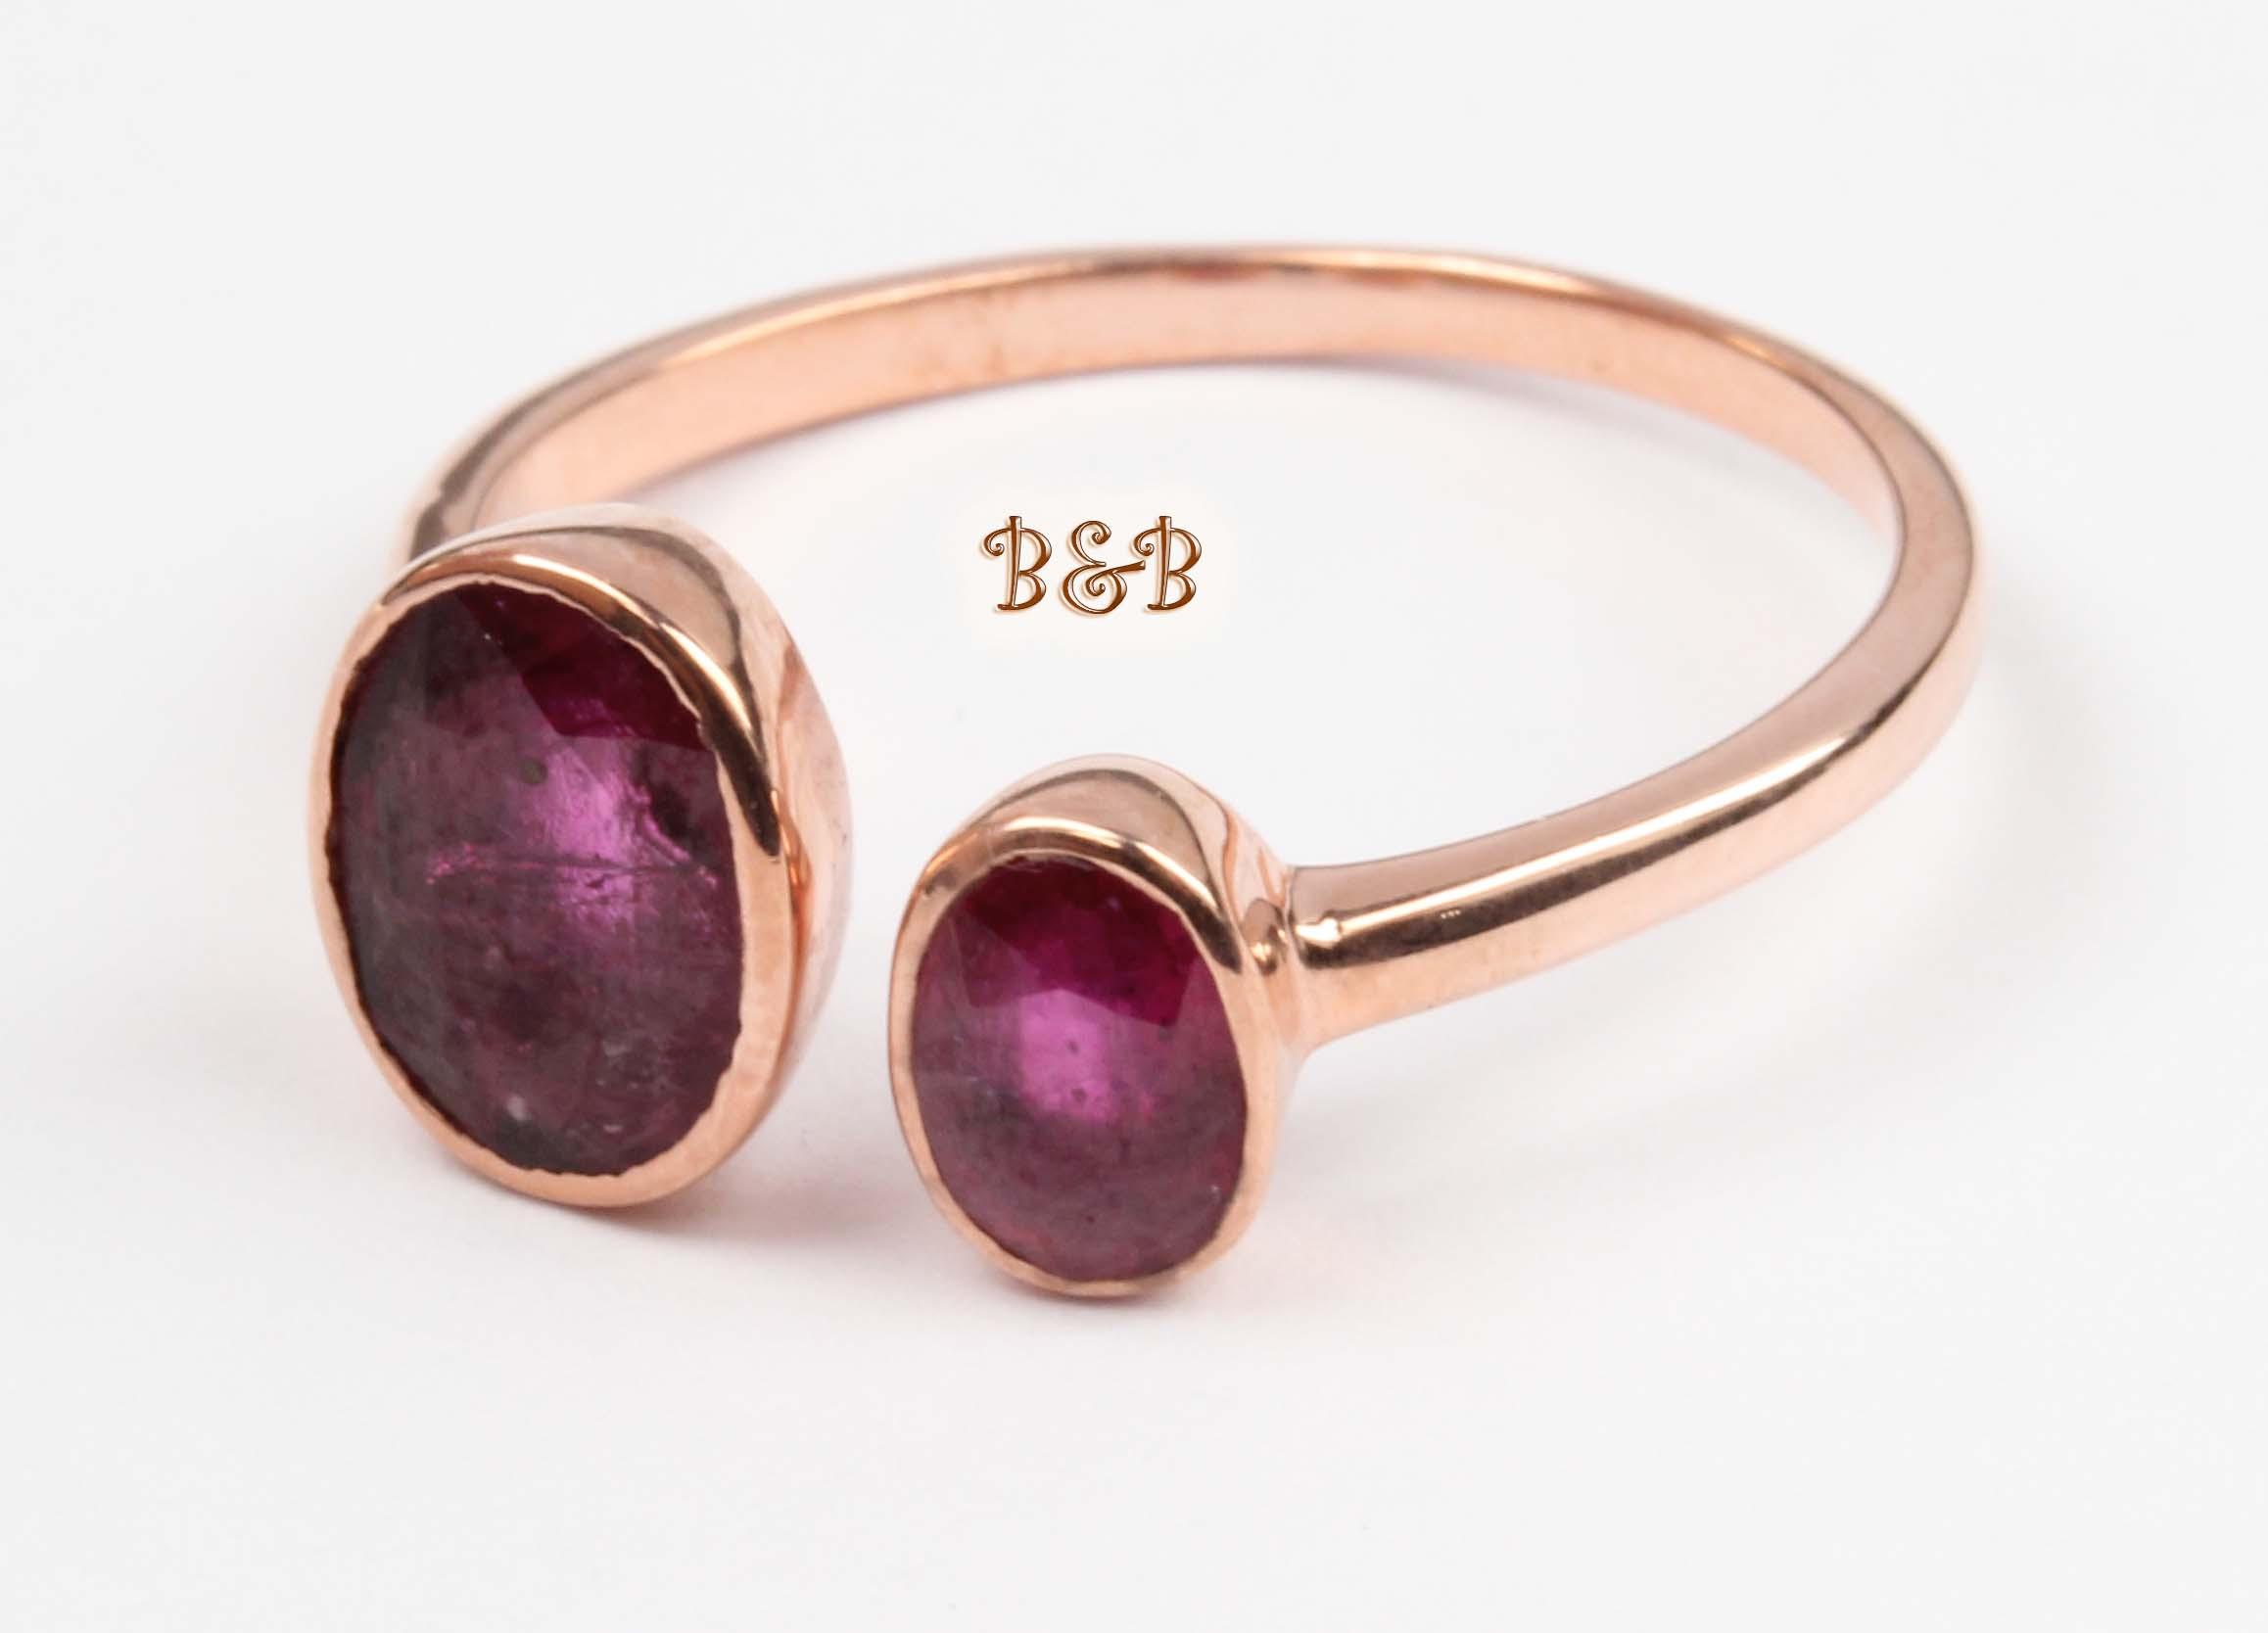 Silver ring_B&B_1646